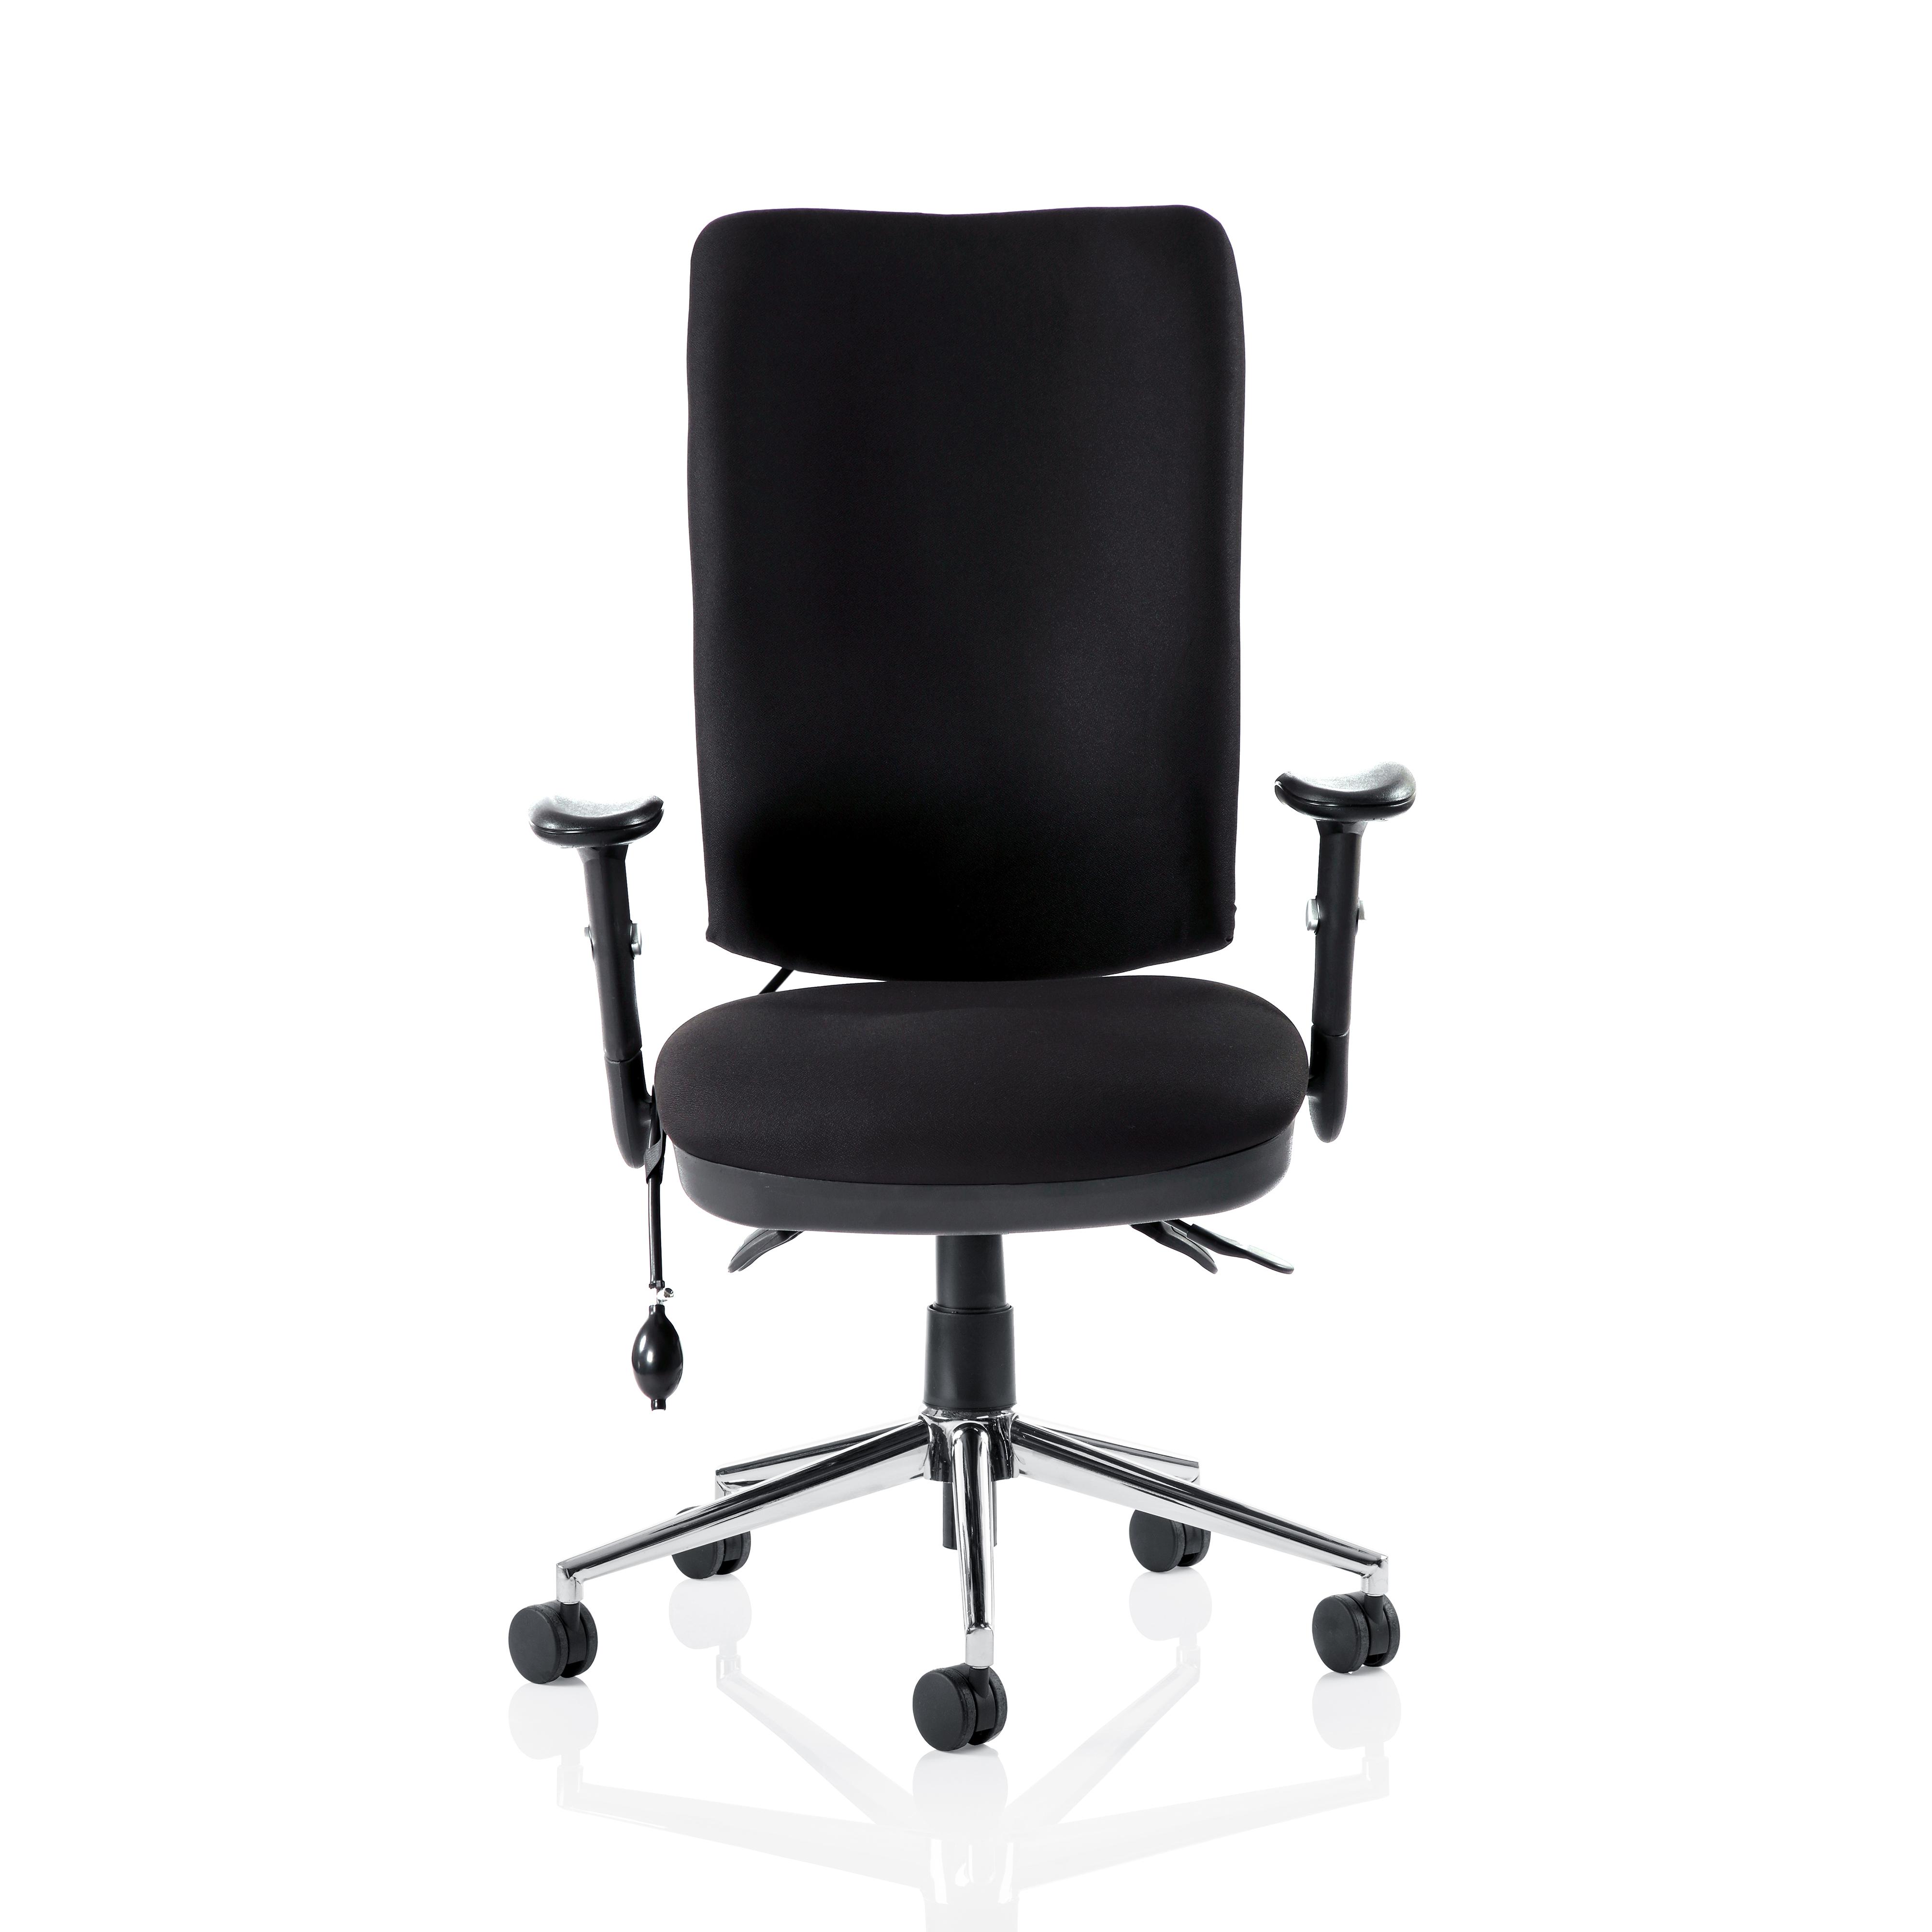 Sonix Support Chiro High Back Chair Black 510x480-540x500-600mm Ref OP000006